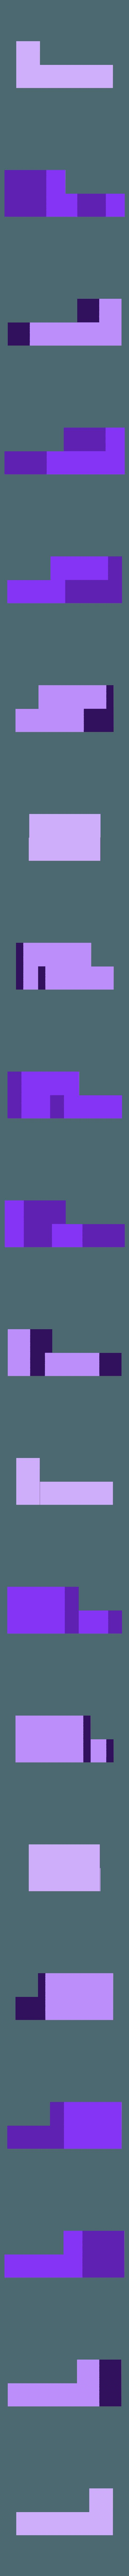 Twins_A_x_2.stl Download free STL file Puzzle - Triple twins • 3D print model, dancingchicken